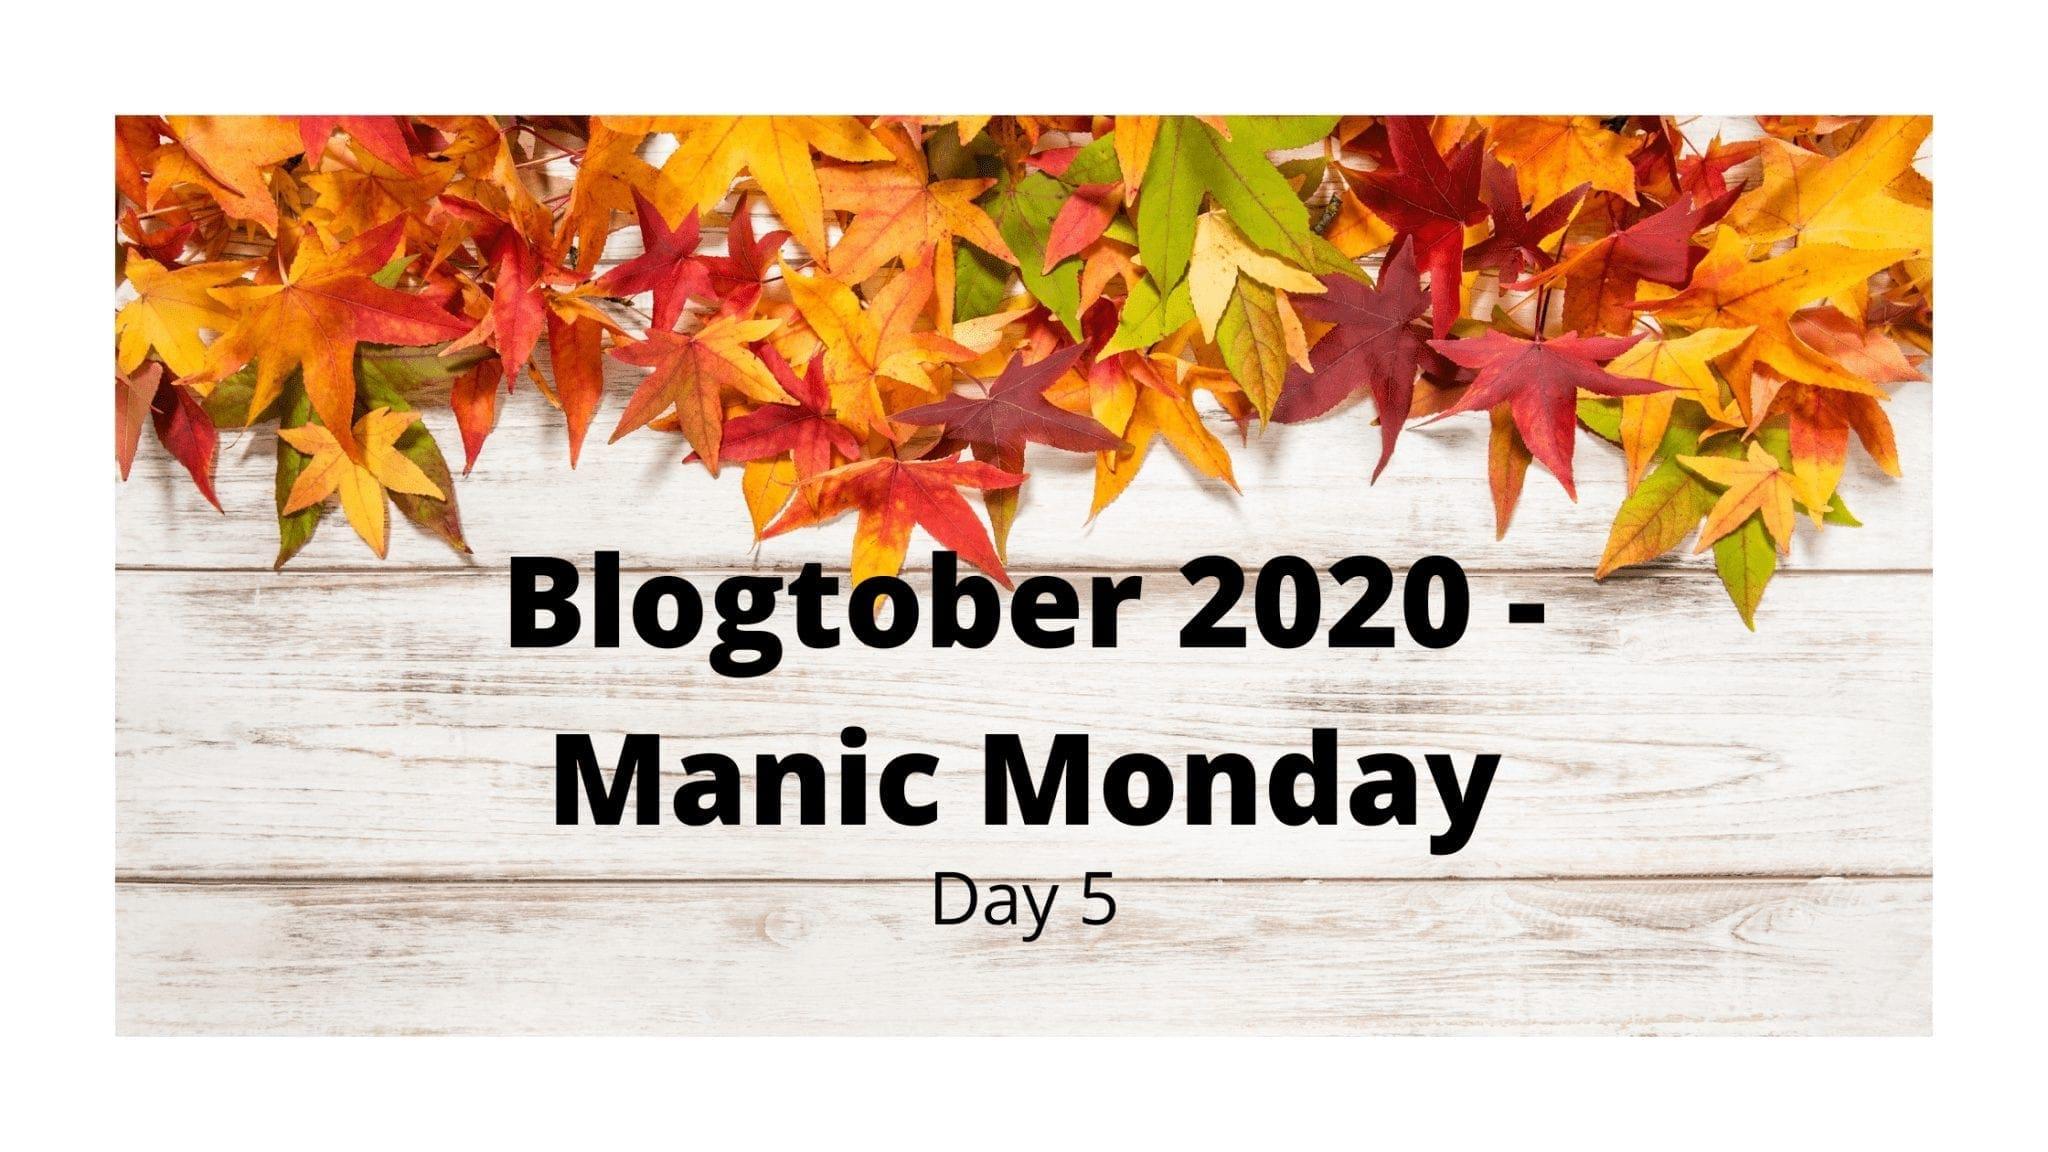 Blogtober 2020 - Manic Monday